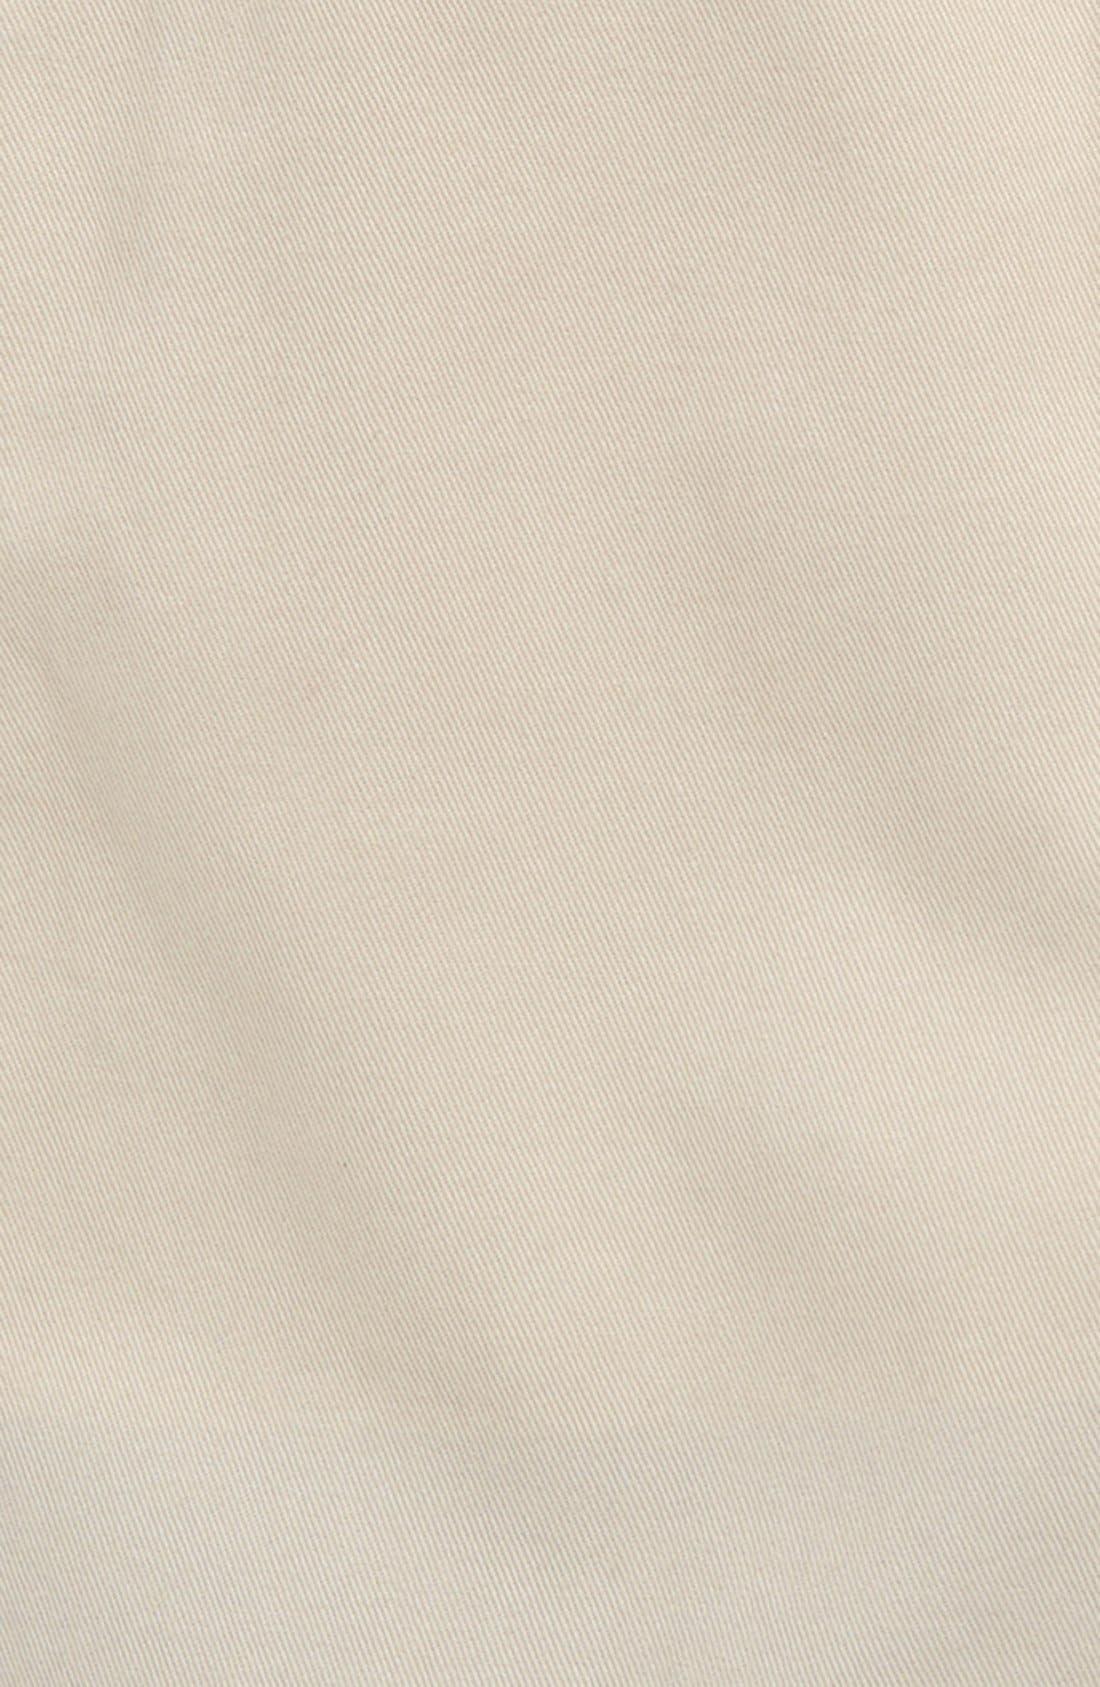 Cotton Chino Shorts,                             Alternate thumbnail 2, color,                             026